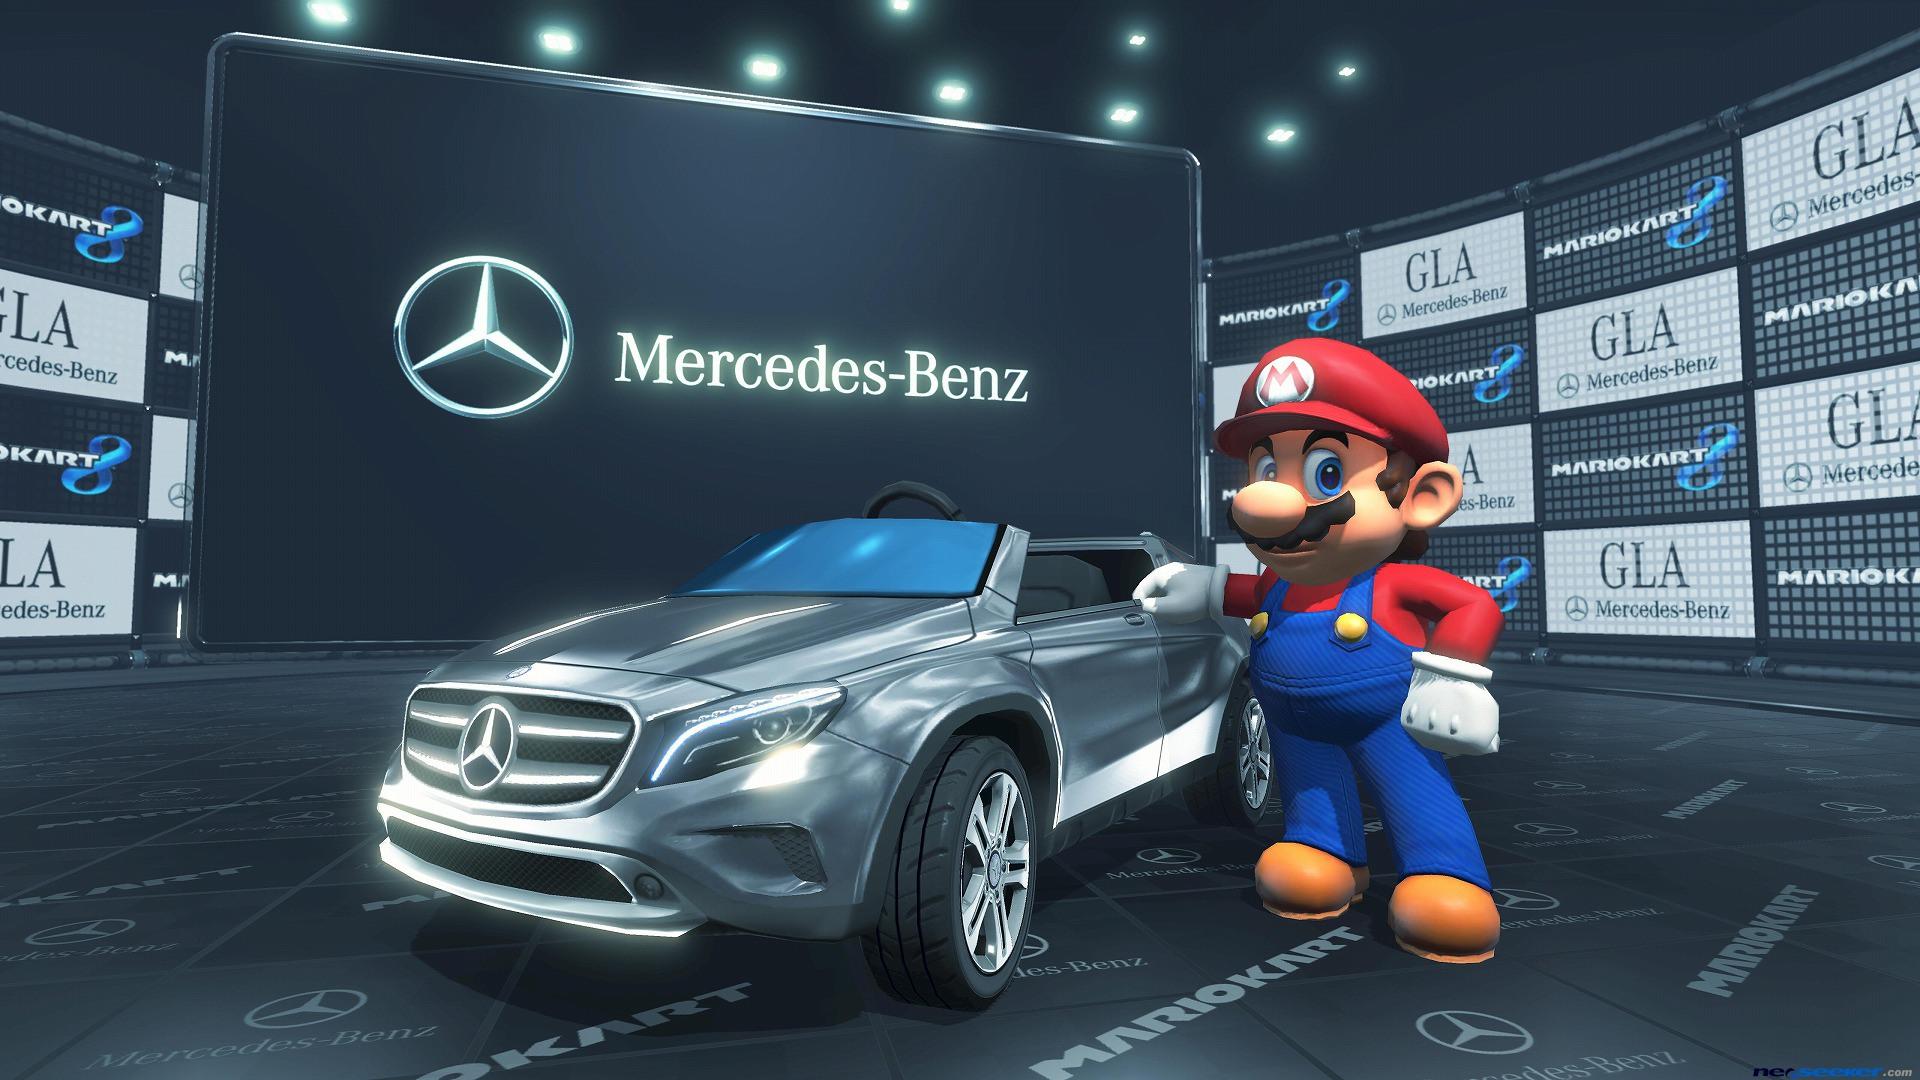 Mario Kart 8 updates this month with Mercedes-Benz DLC